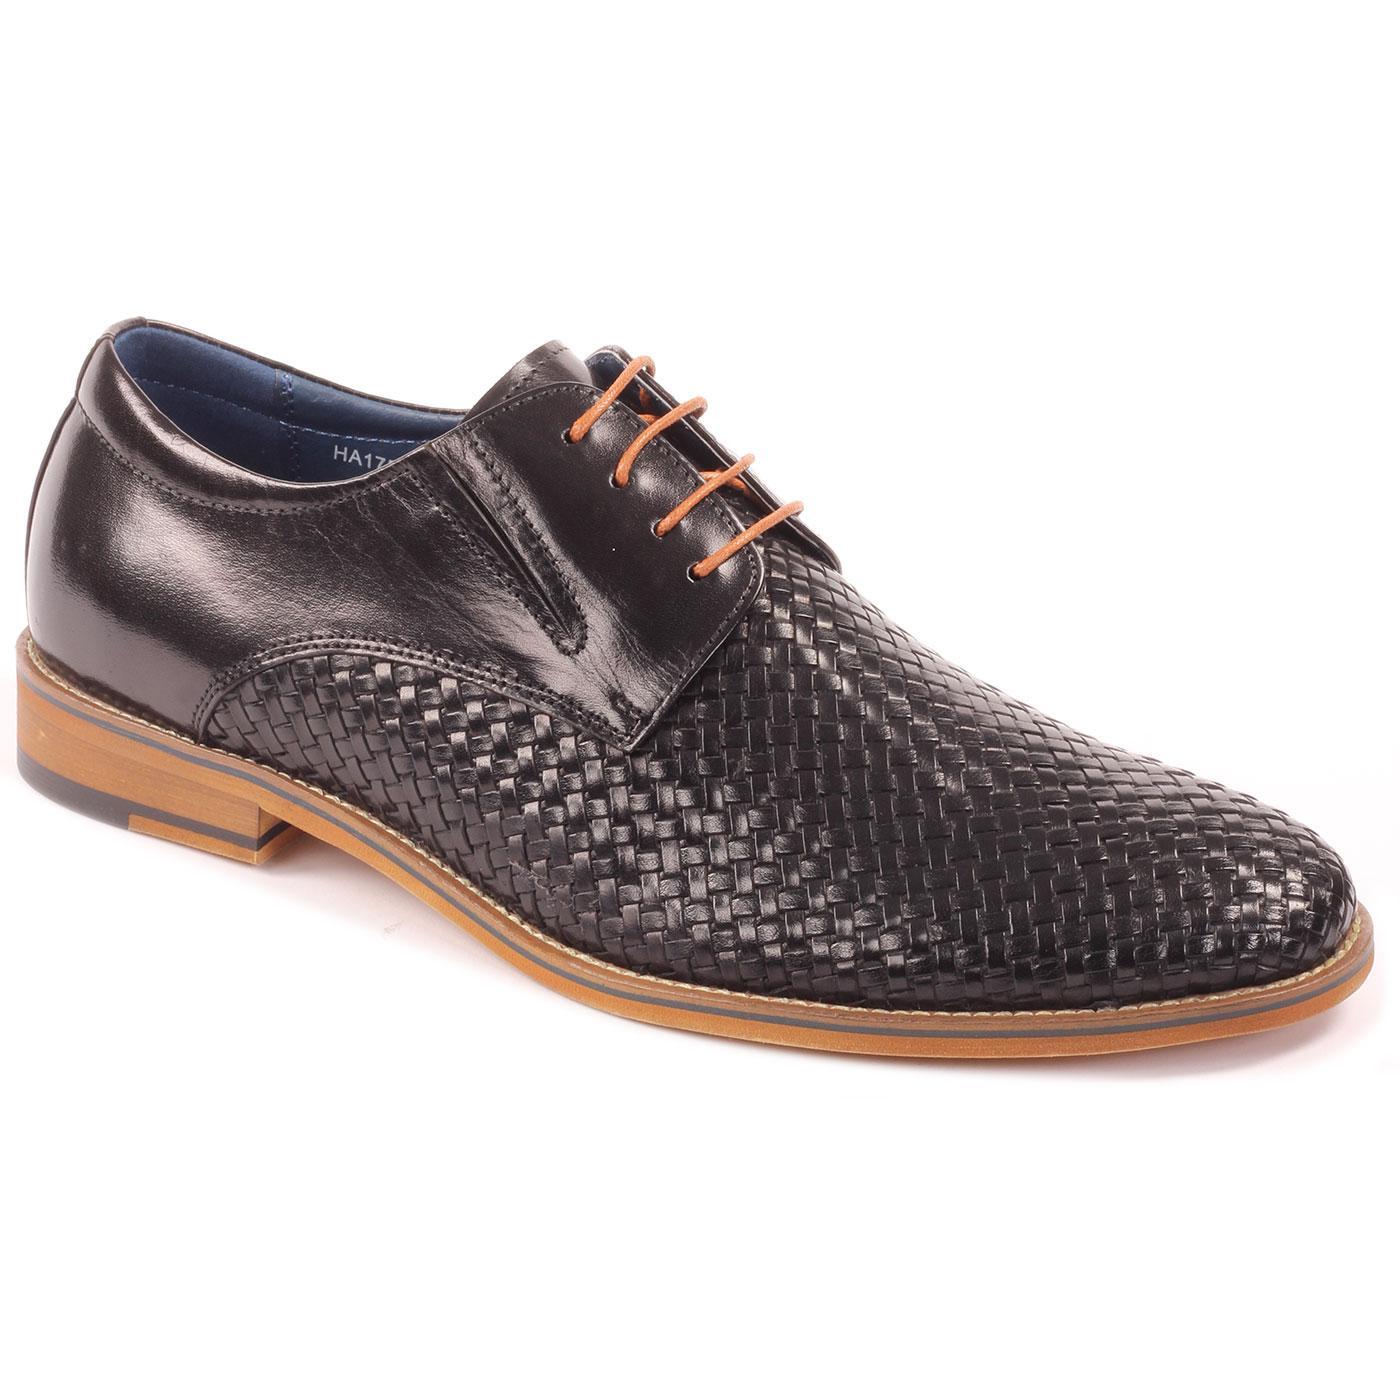 Toni SERGIO DULETTI Basket Weave Derby Shoes BLACK